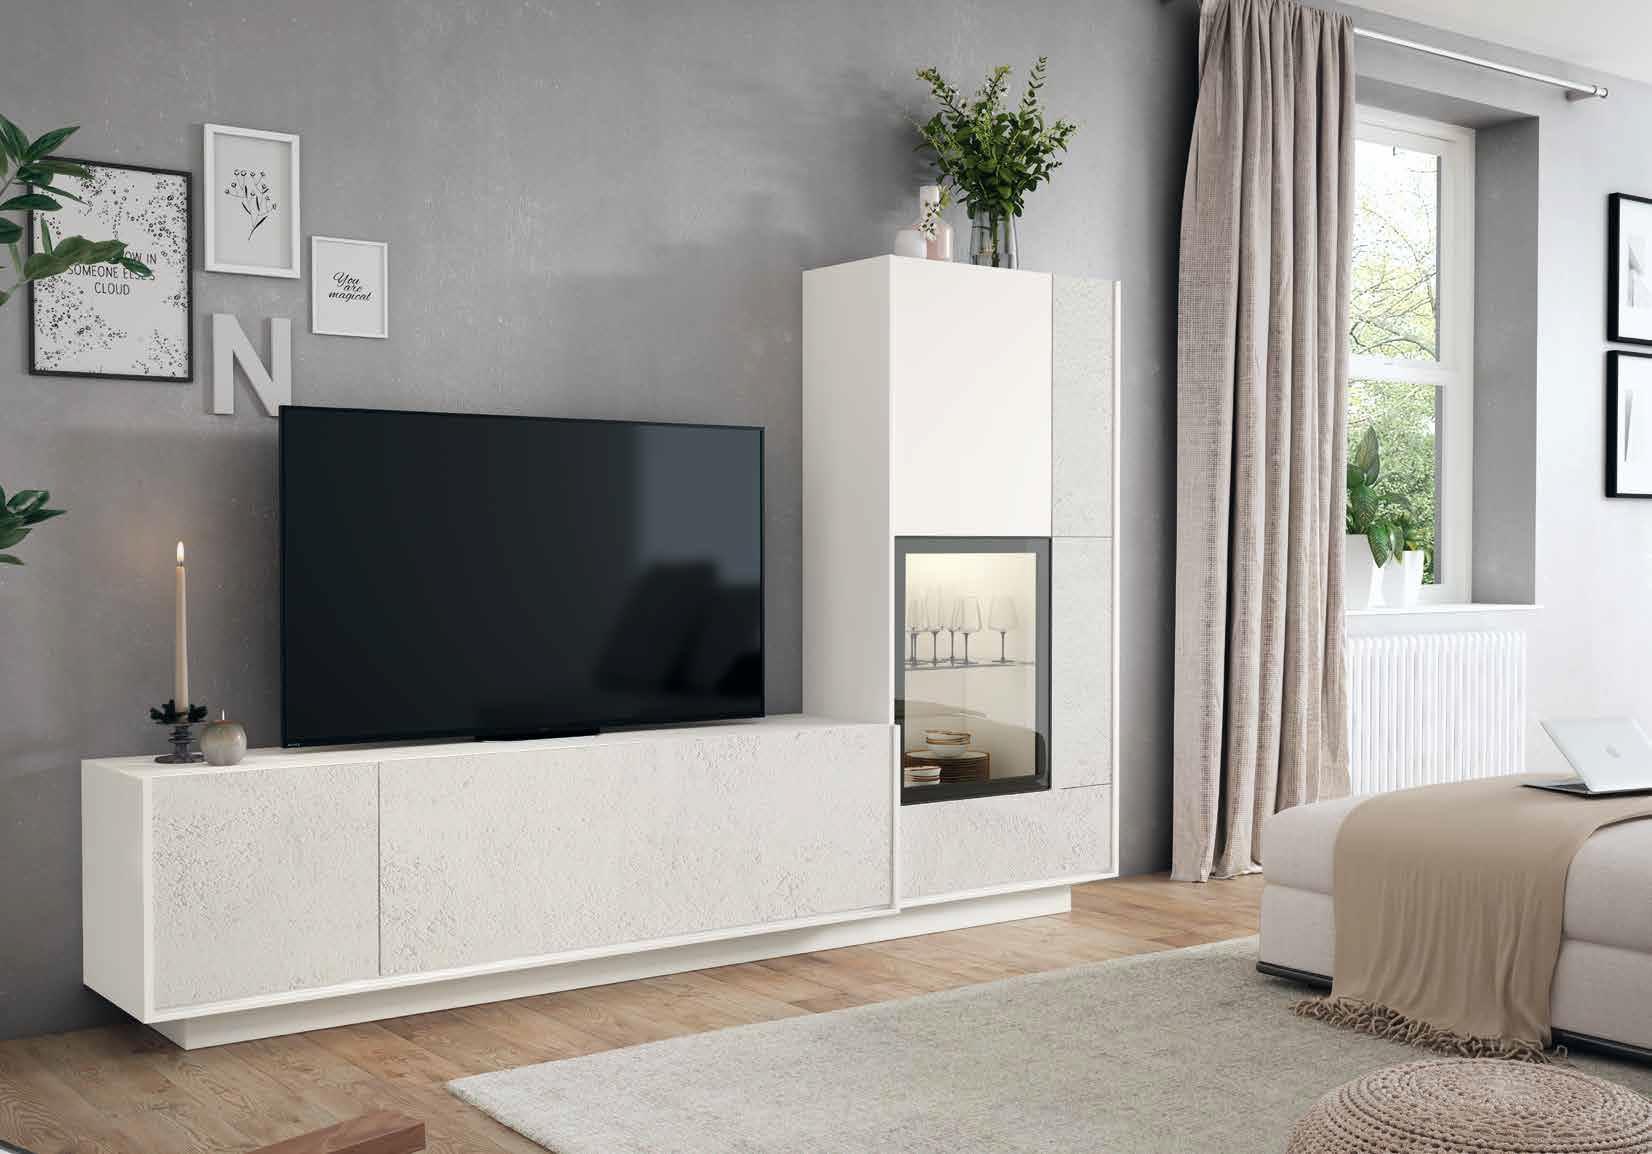 salon-moderno-Nativ-2019-muebles-paco-caballero-0920-5c8cea9d9d776